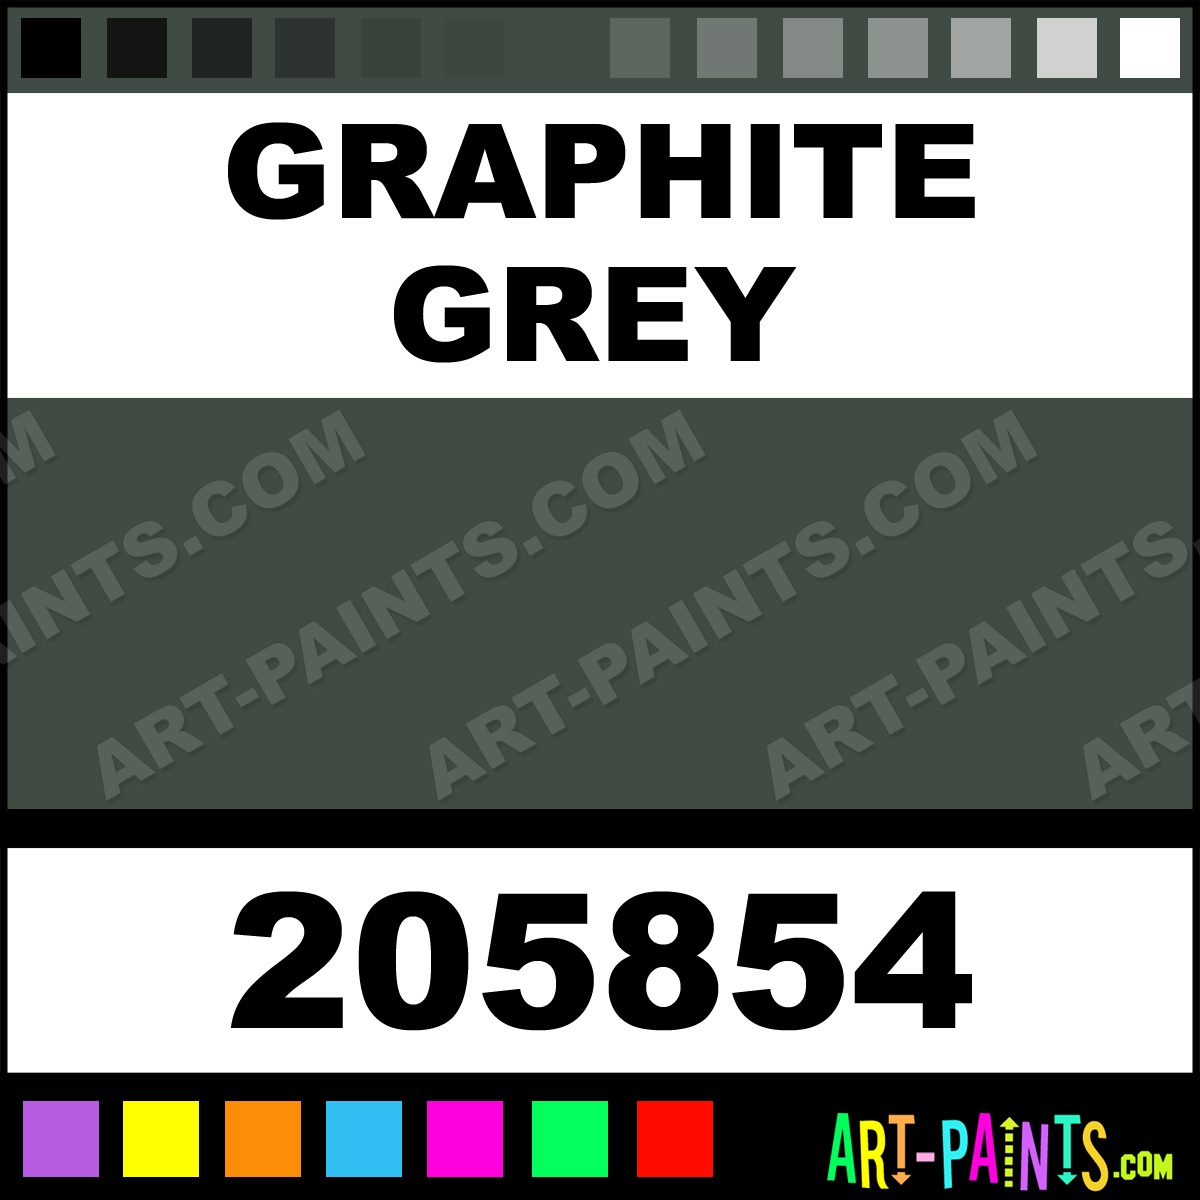 Graphite+grey+paint